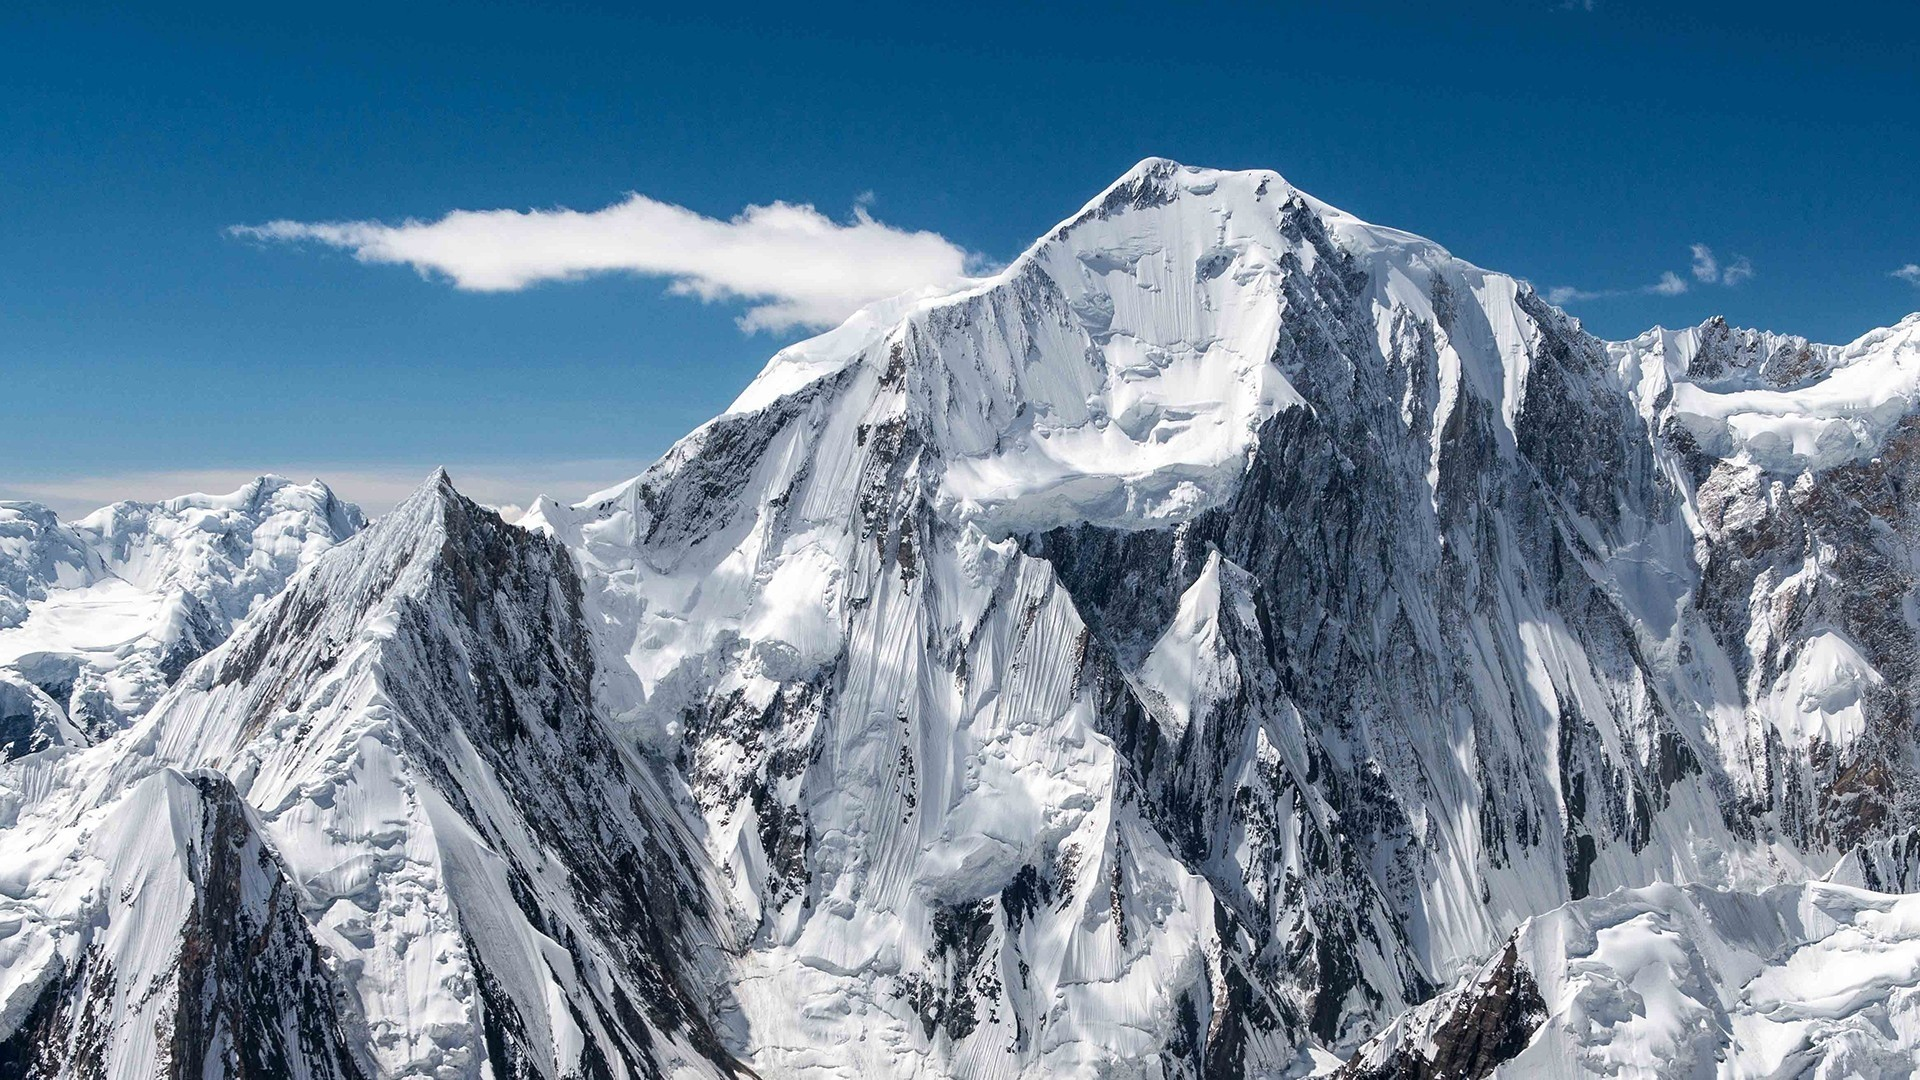 Snow Mountain PC Wallpaper